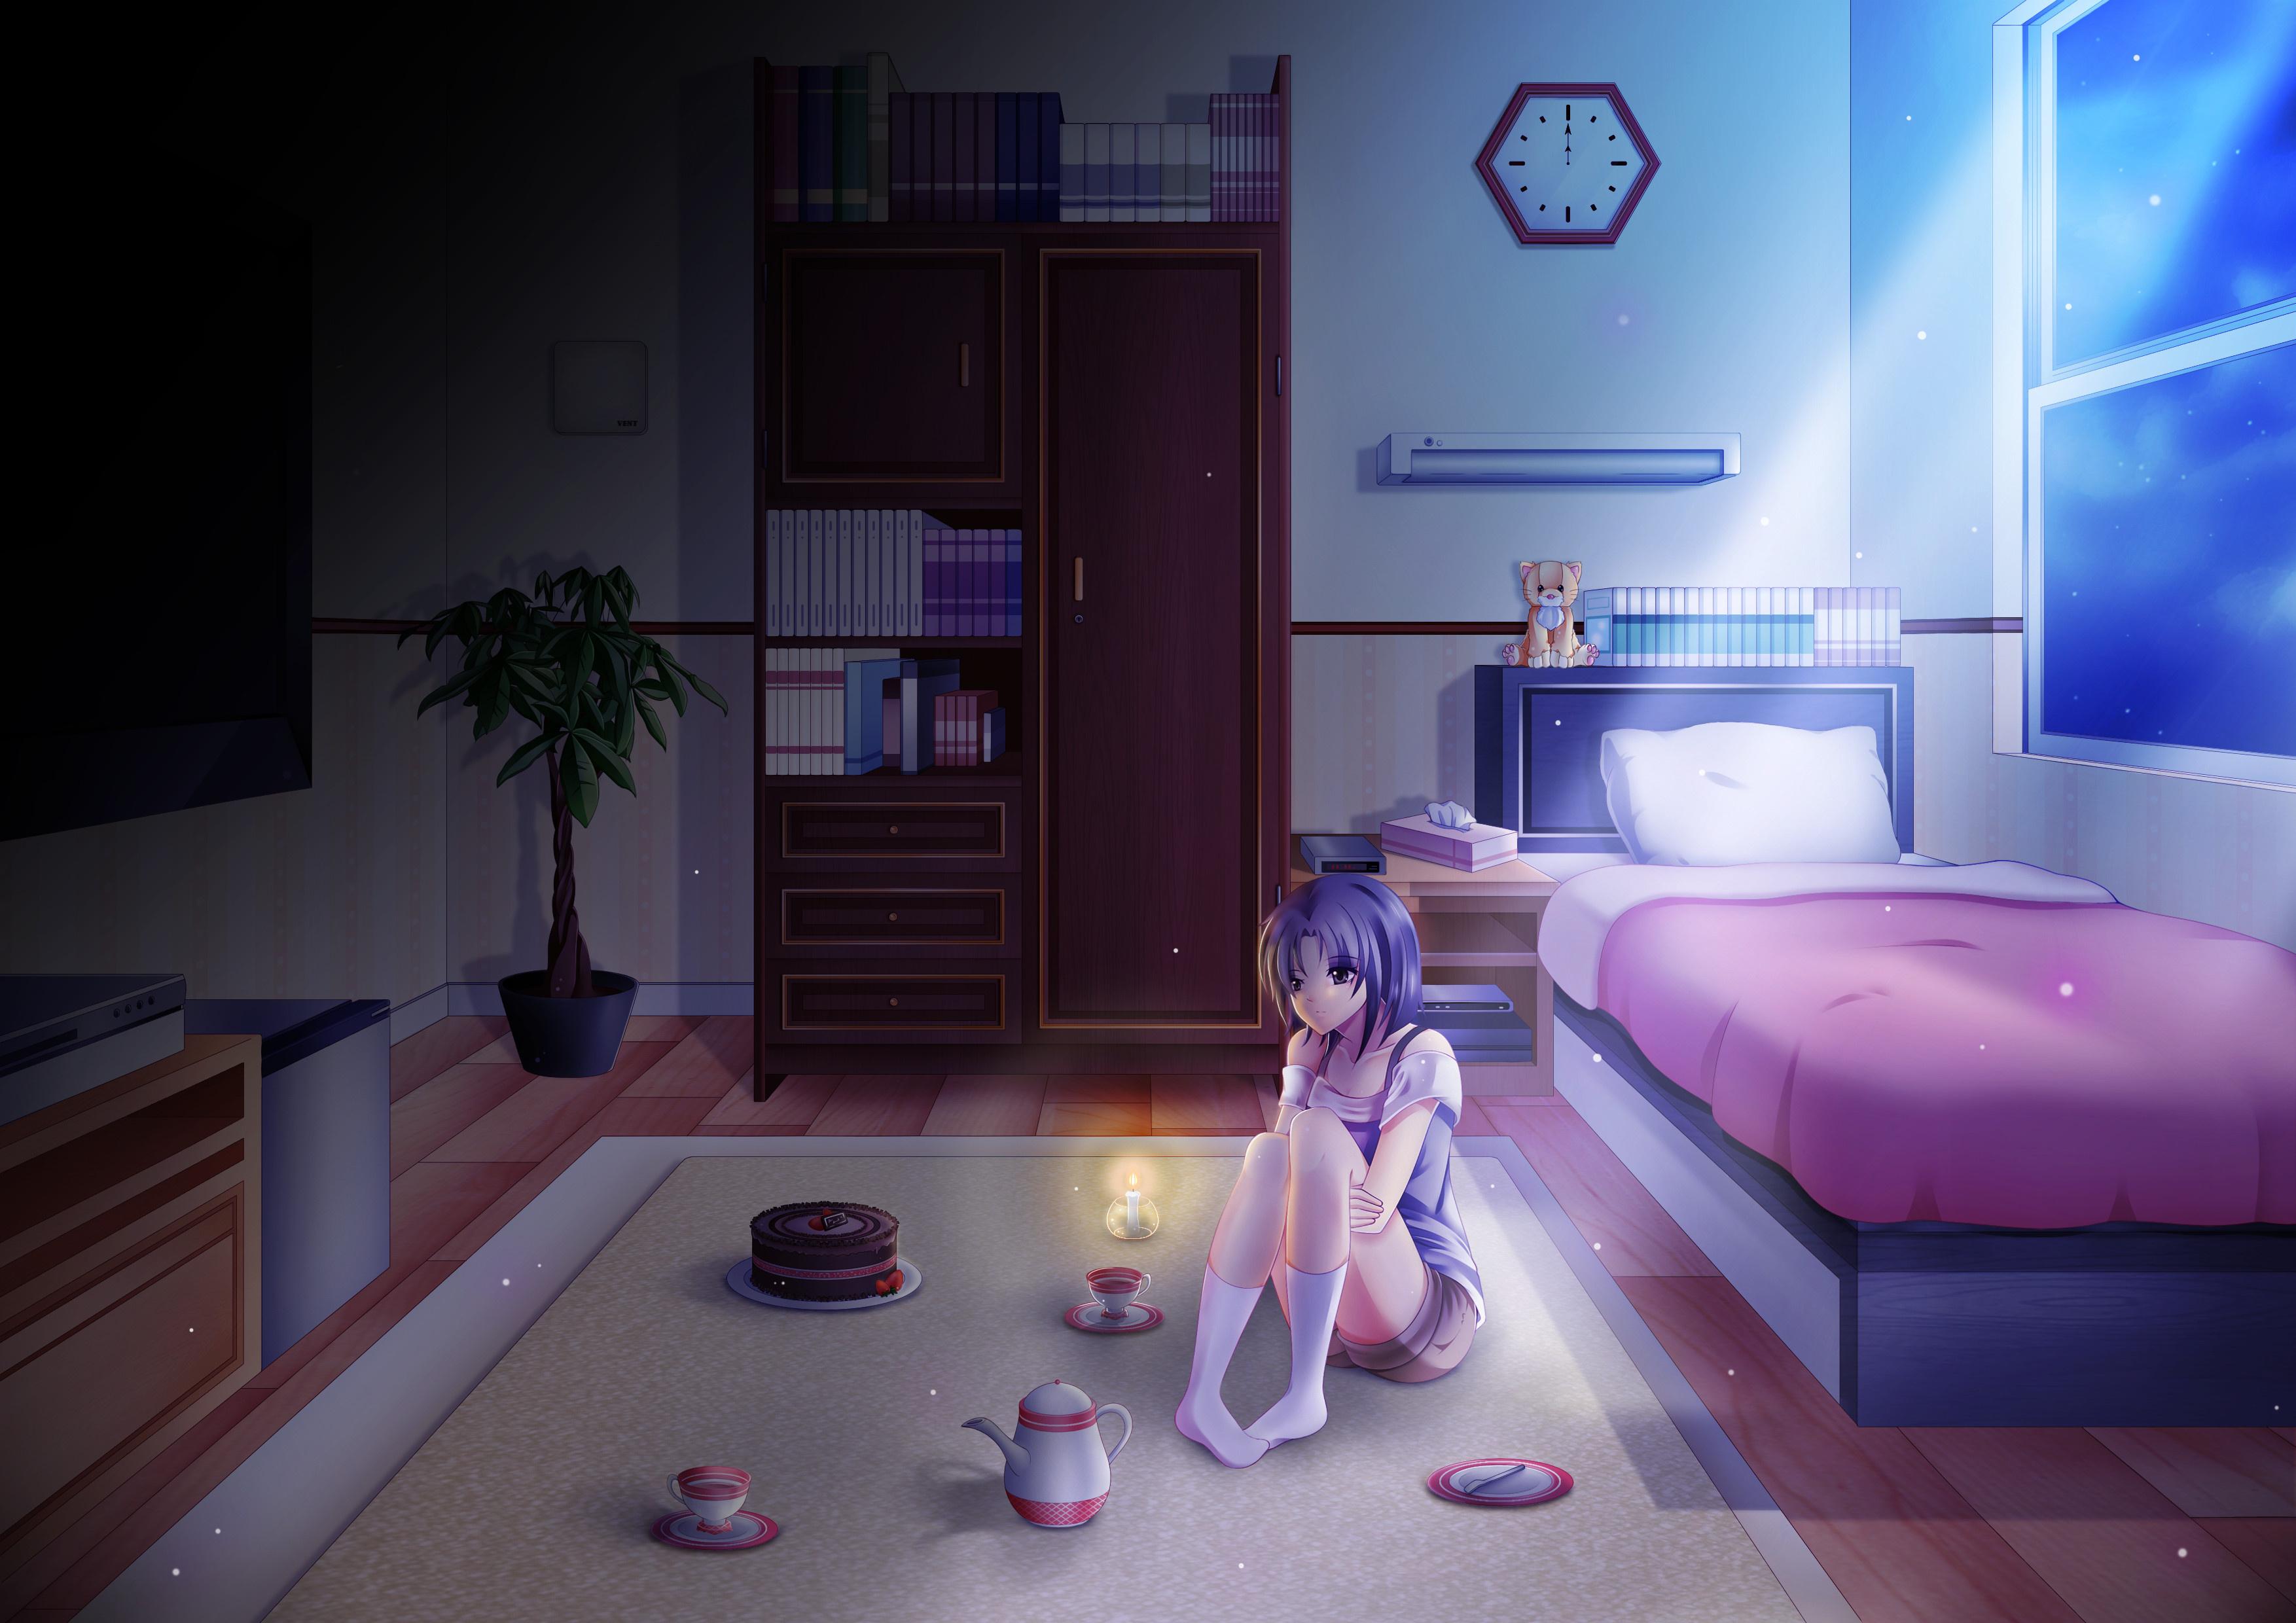 Anime girl alone in room on her birthday hd anime 4k